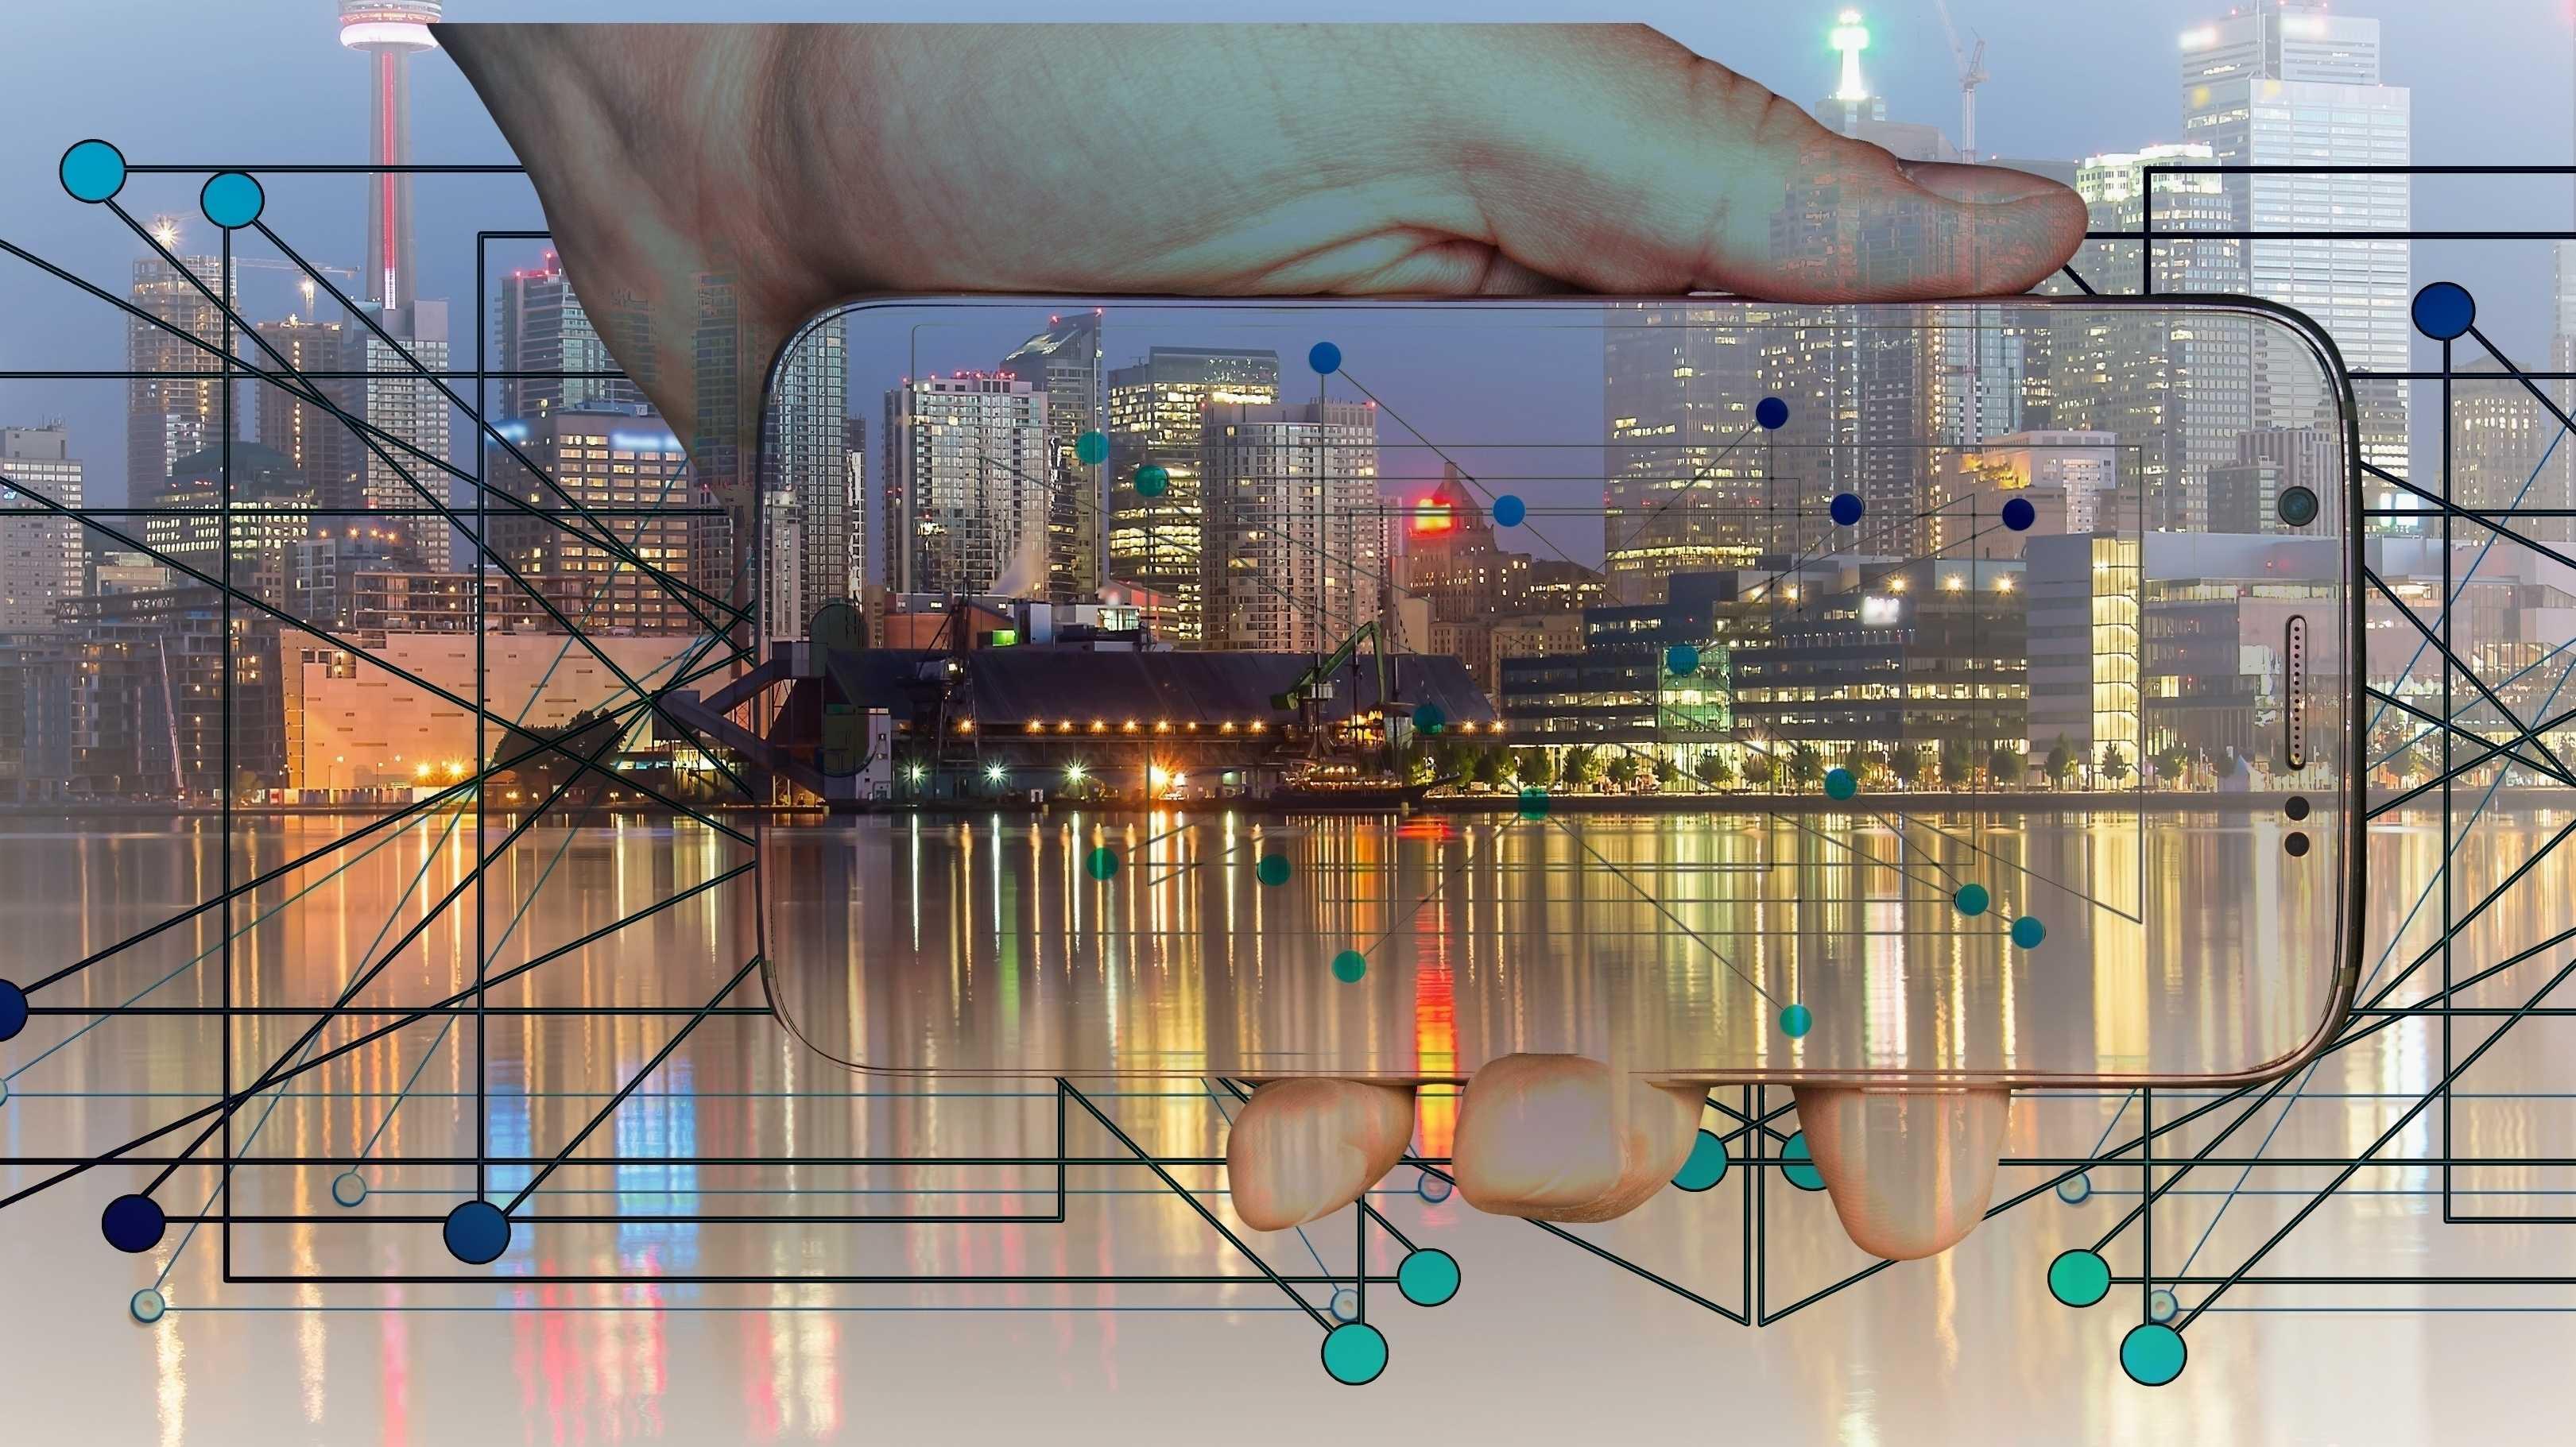 Projekt, Arbeitsplätze, Smart City, Stadt, Smartphone